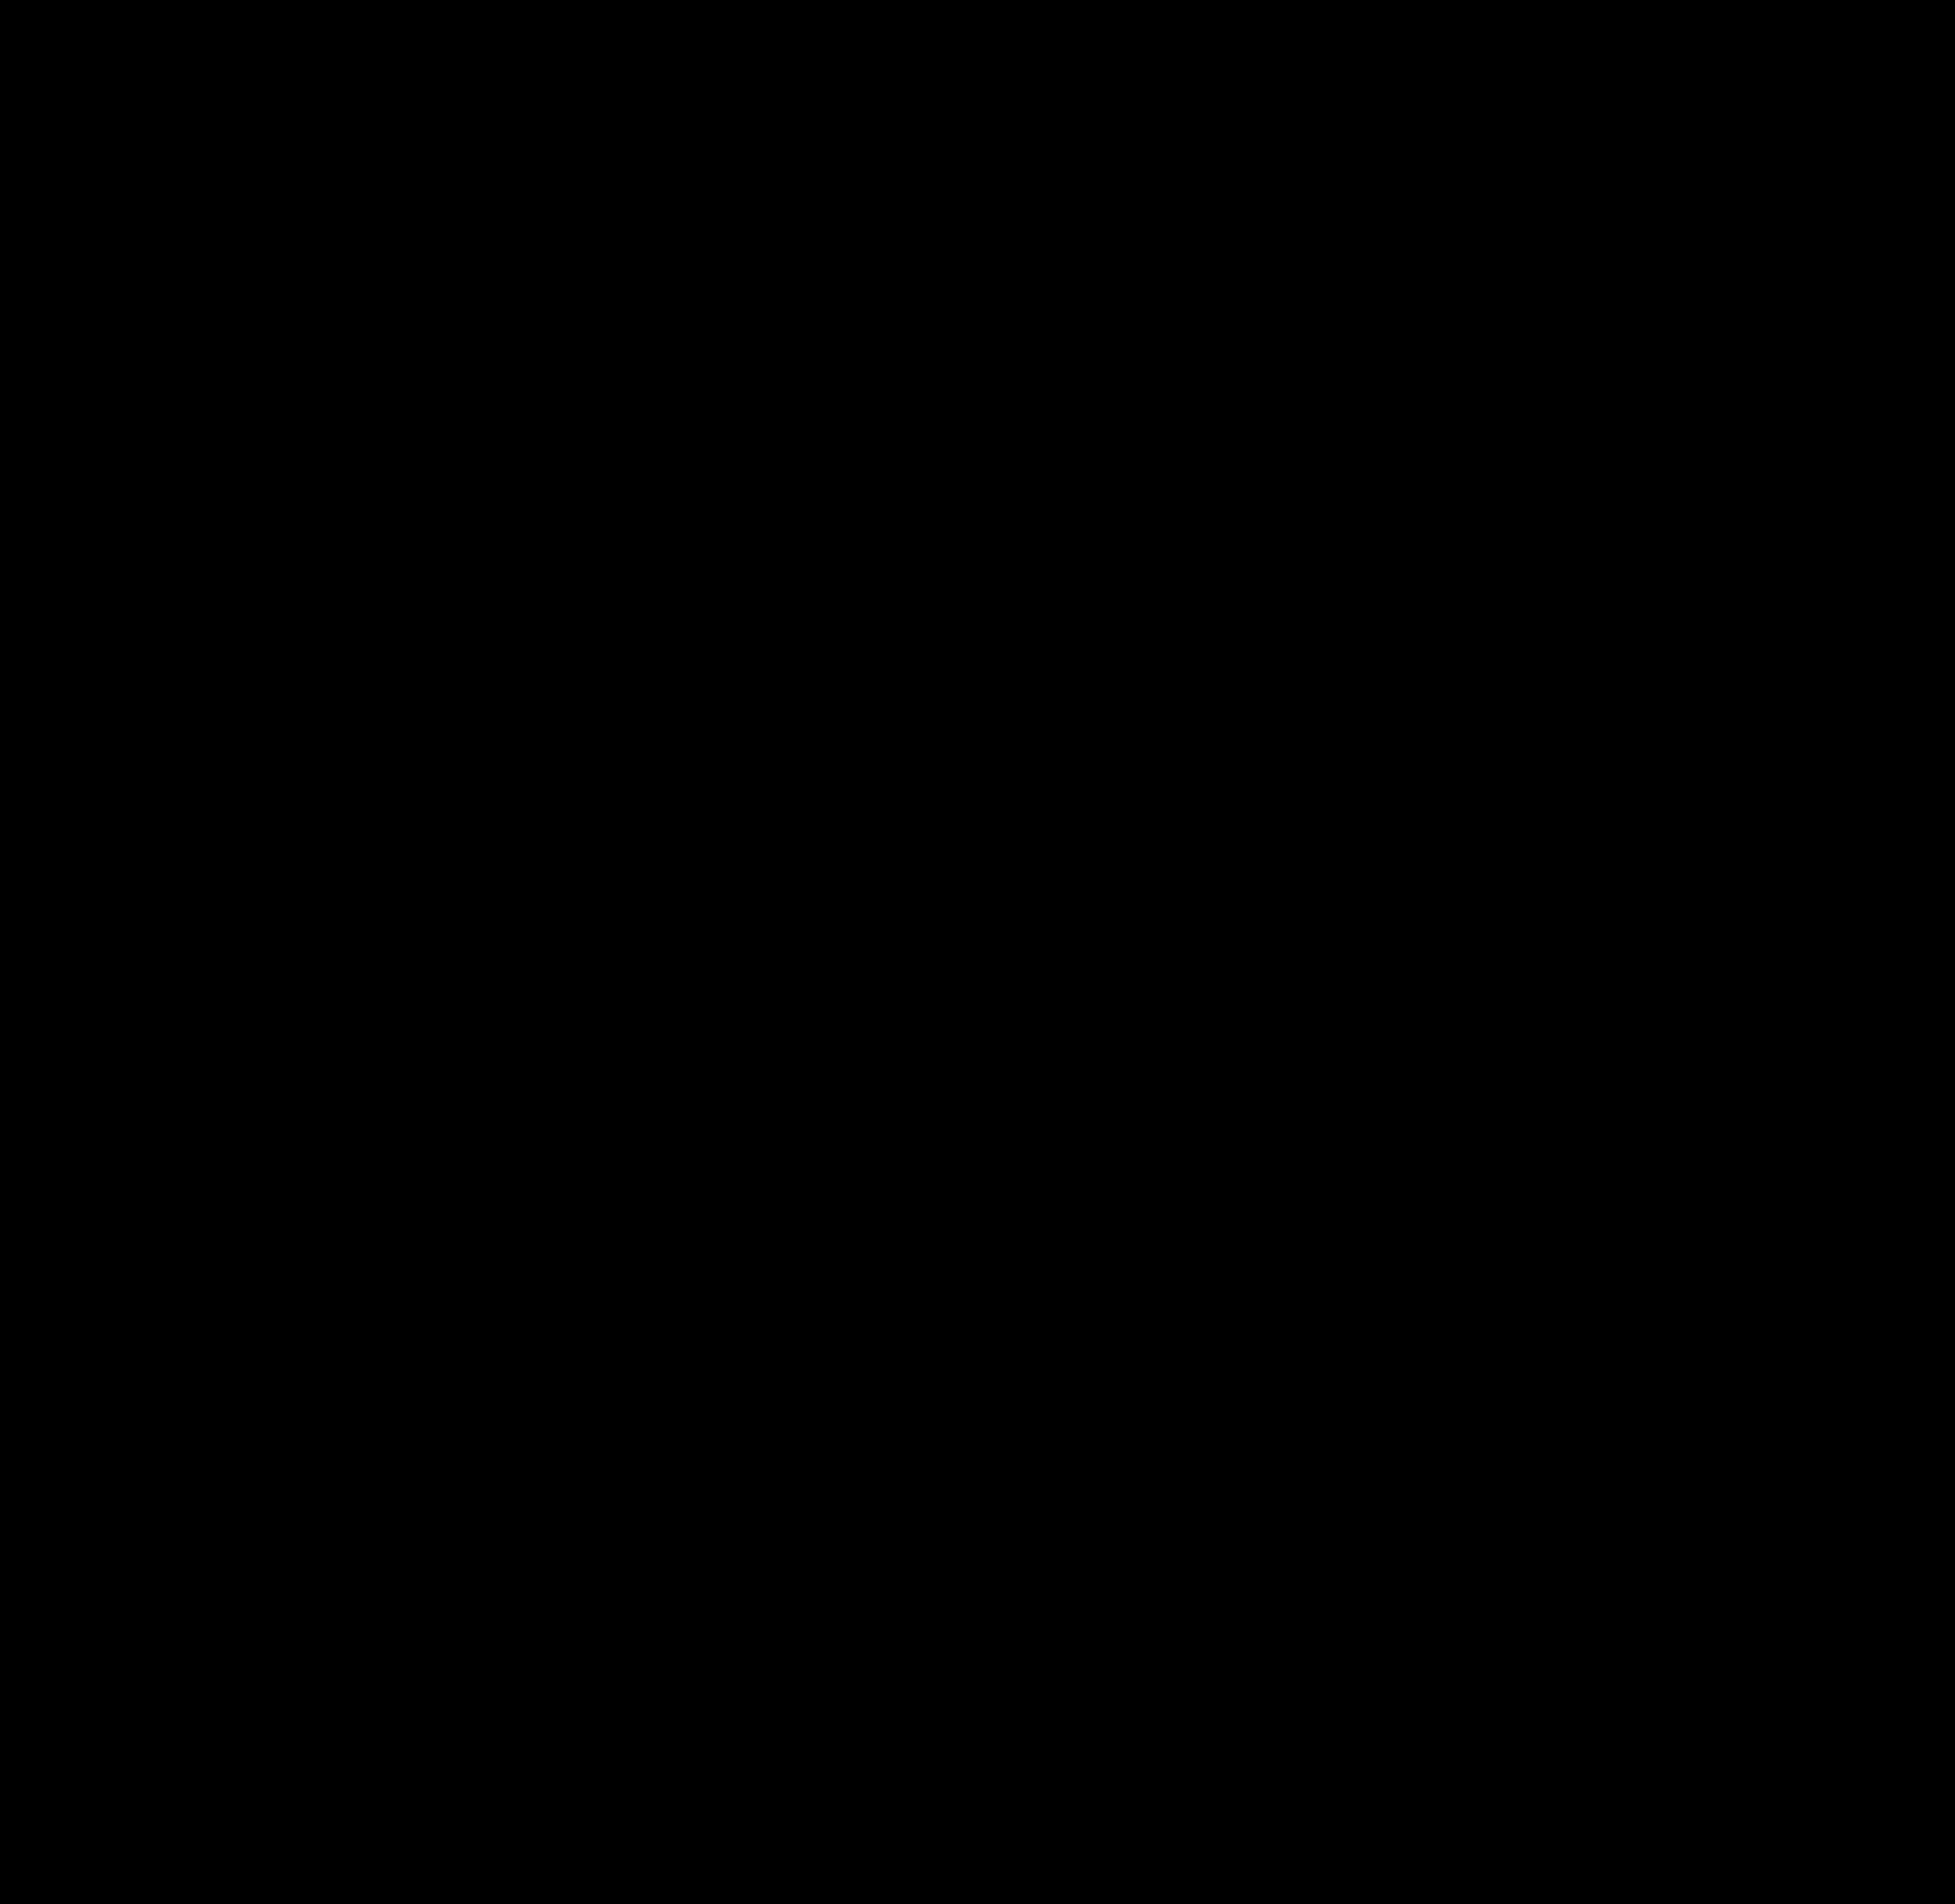 Flourish clipart separation line. Divider frame icons png